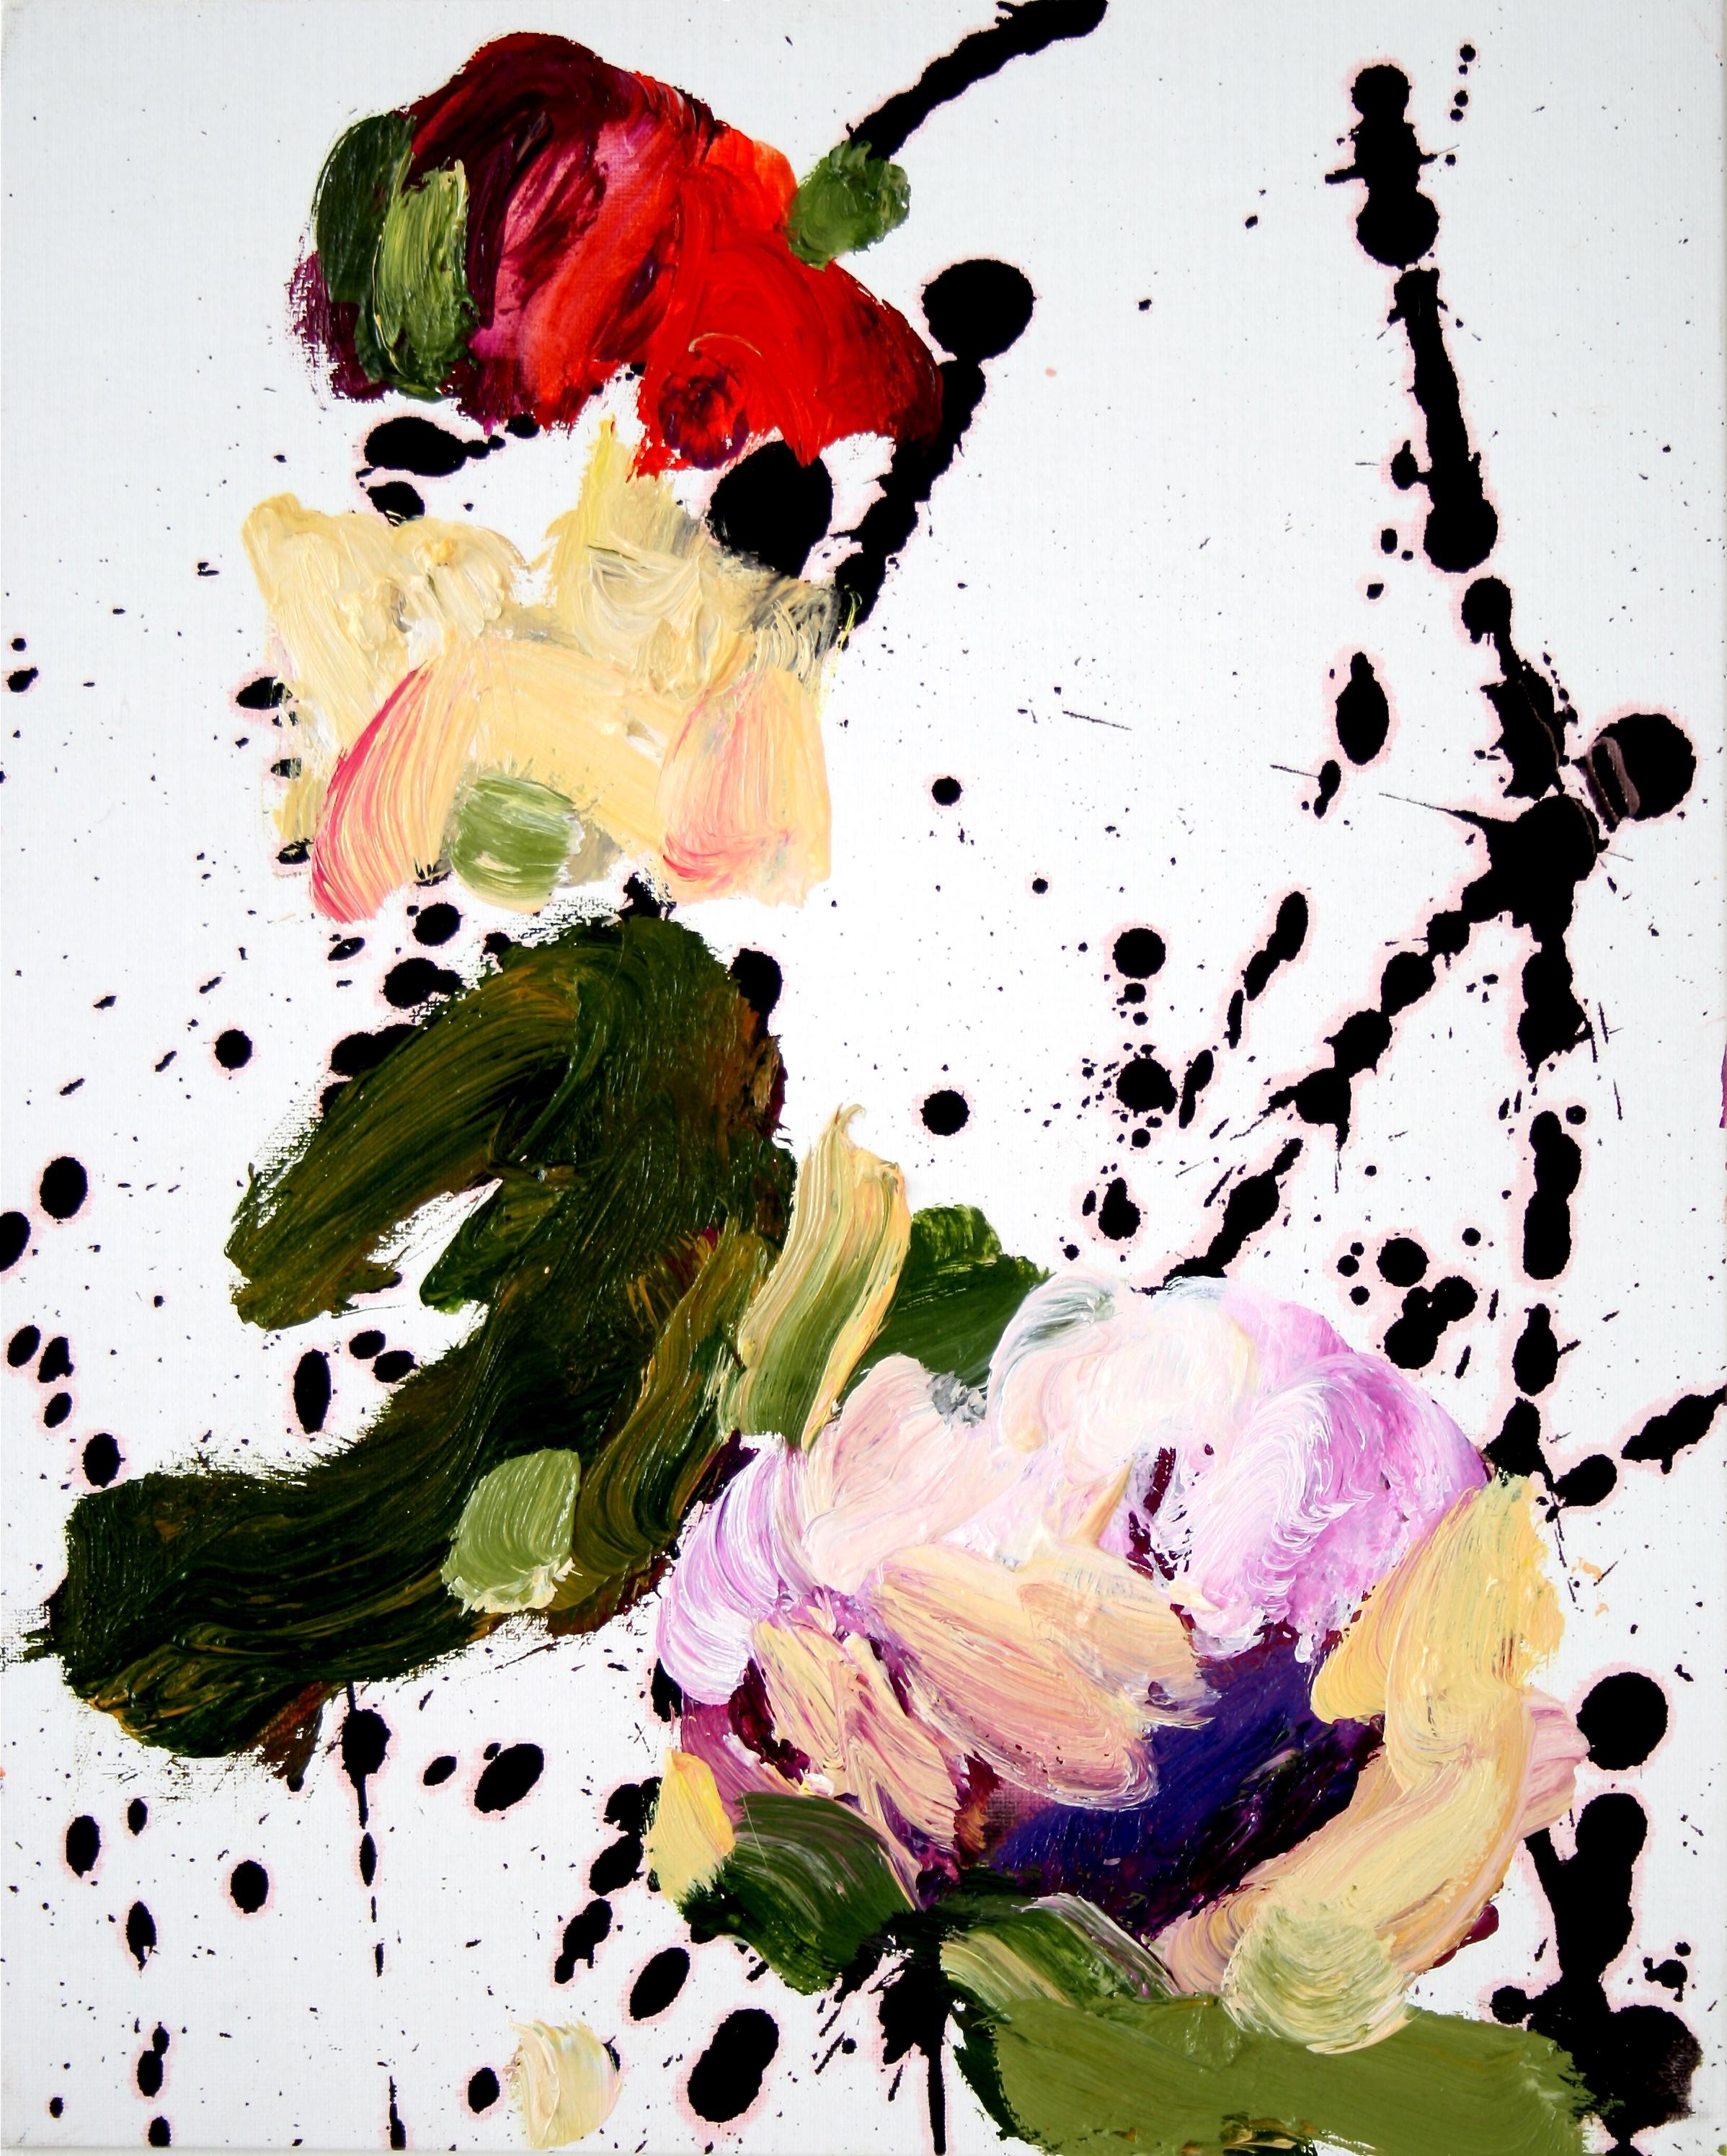 9 Fringe 2 2012 Oil on canvas board 41 x 33cm.JPG